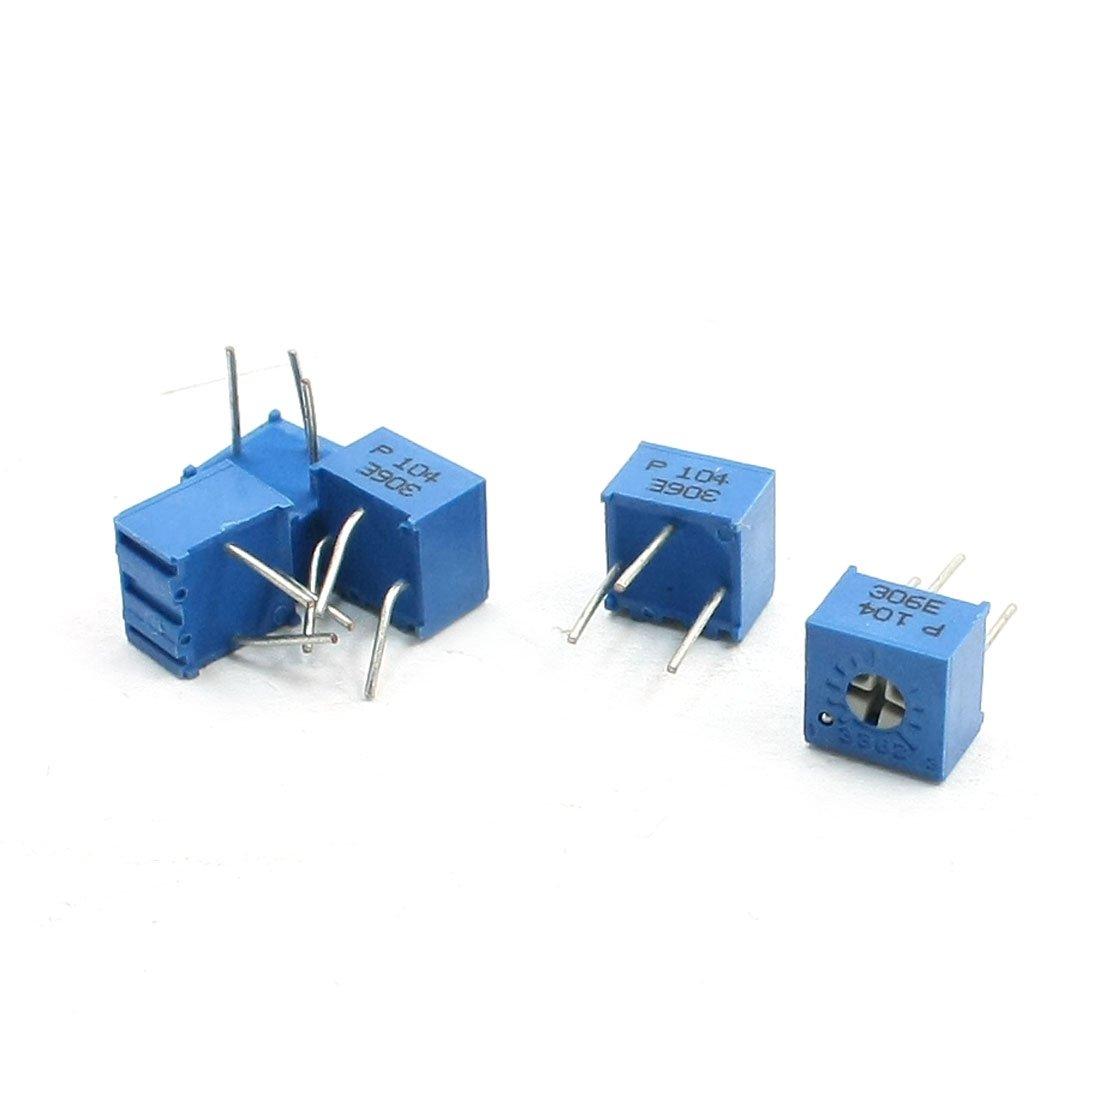 3296W 100K Trim Pot Potentiometer Trimmer Variable Resistor Potentiometer 20pcs